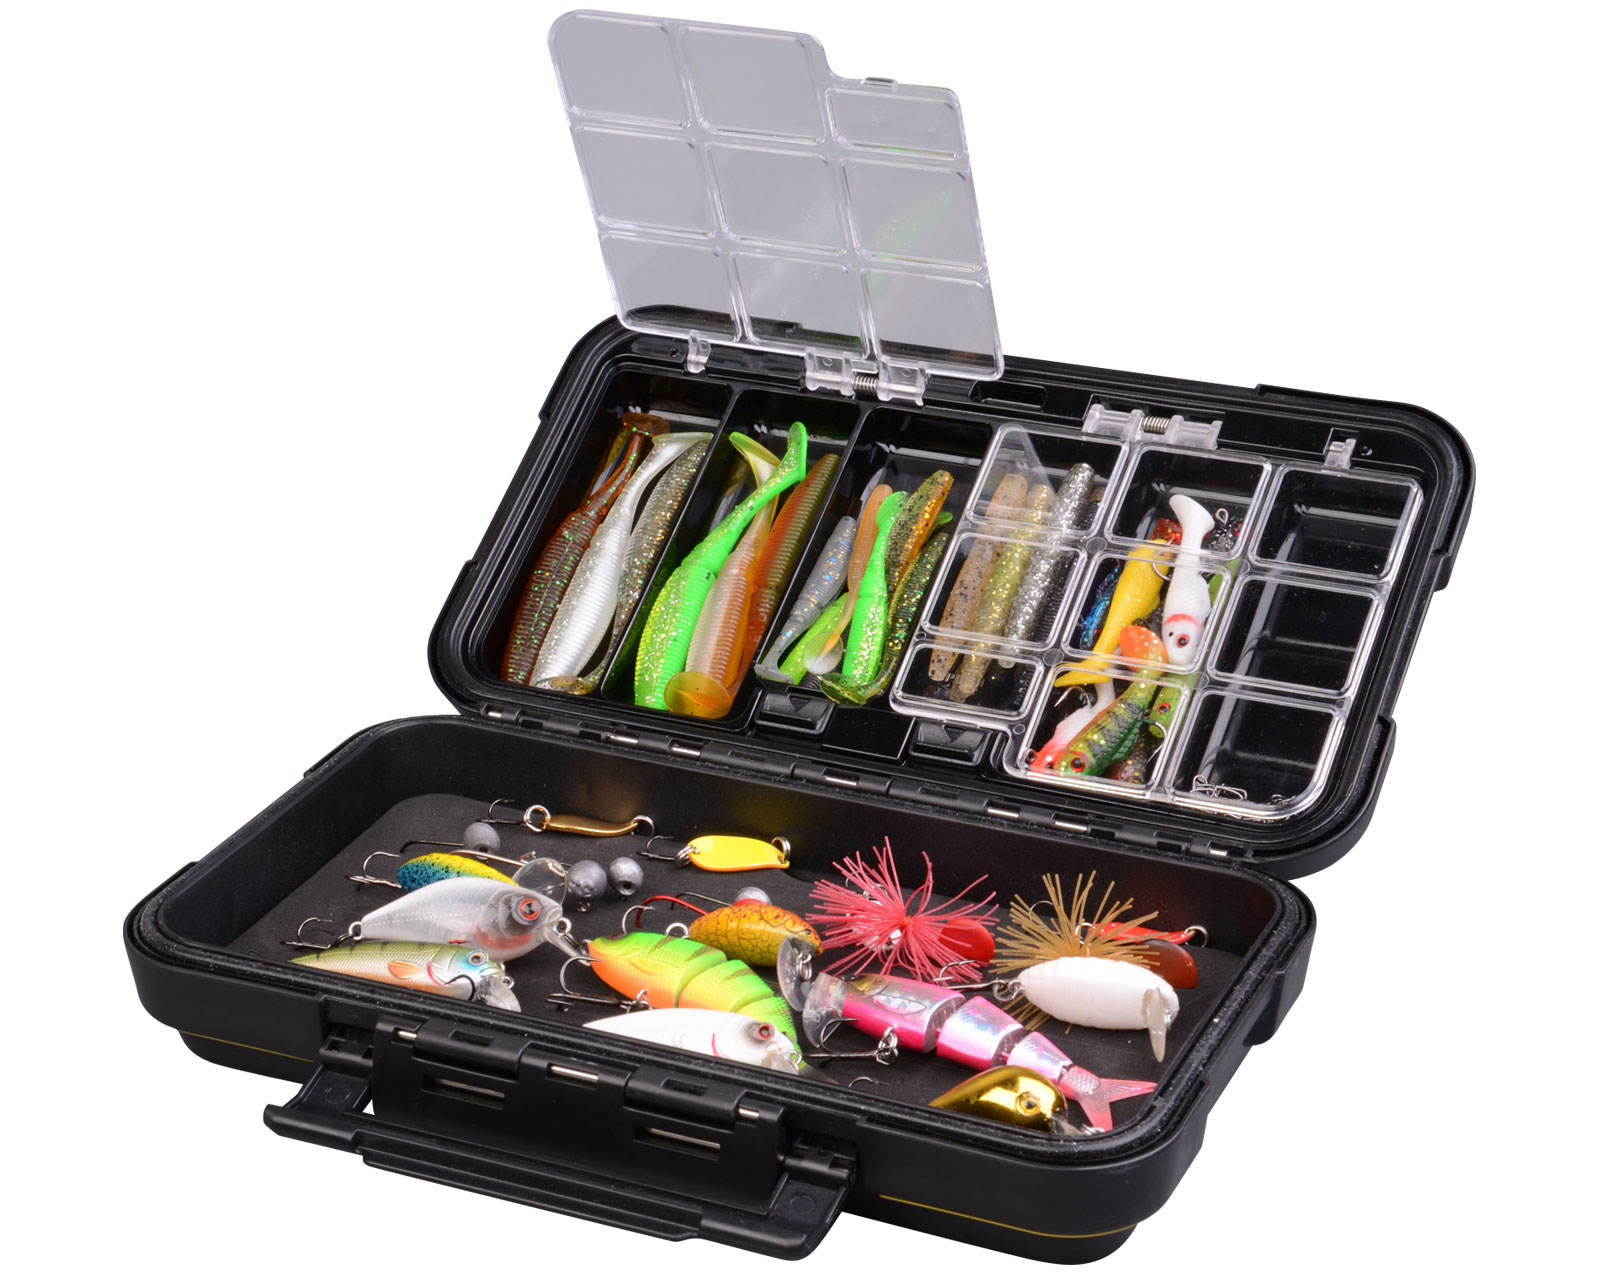 Коробка рыболовная SPRO MULTI STOCKER Size XL 197x115x50mm, Ящики и чехлы - арт. 183310343